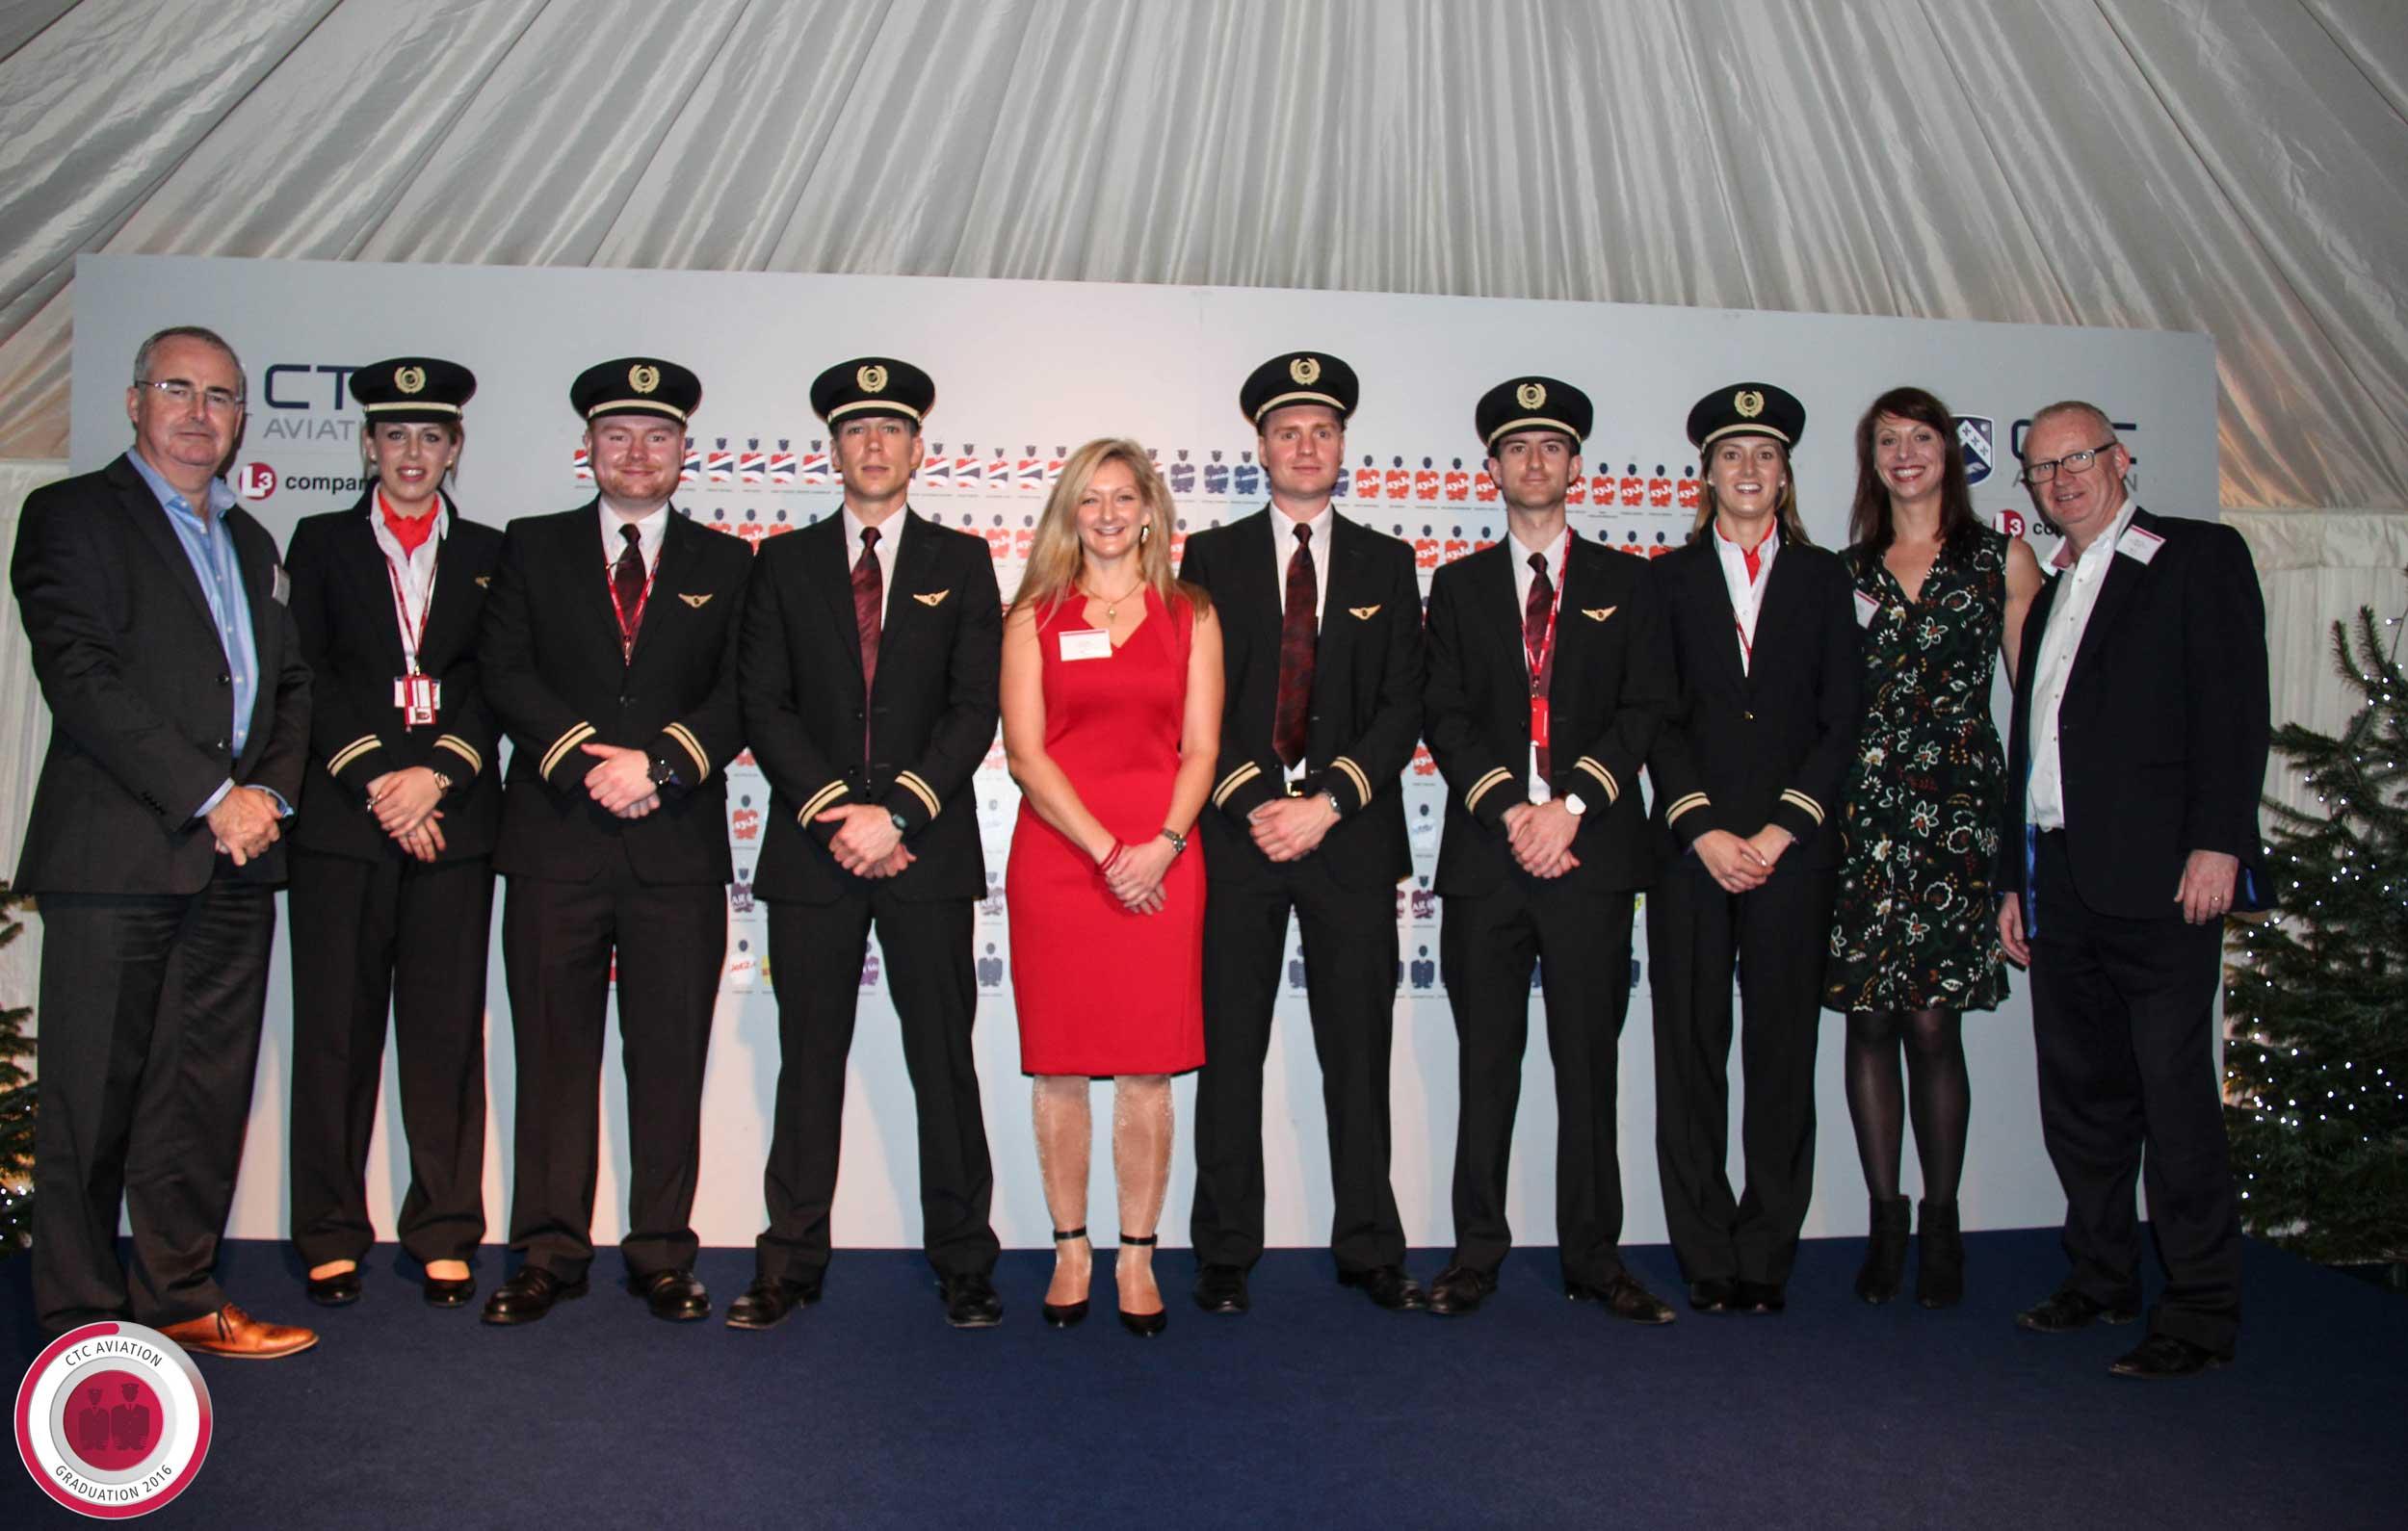 Virgin Atlantic pilots